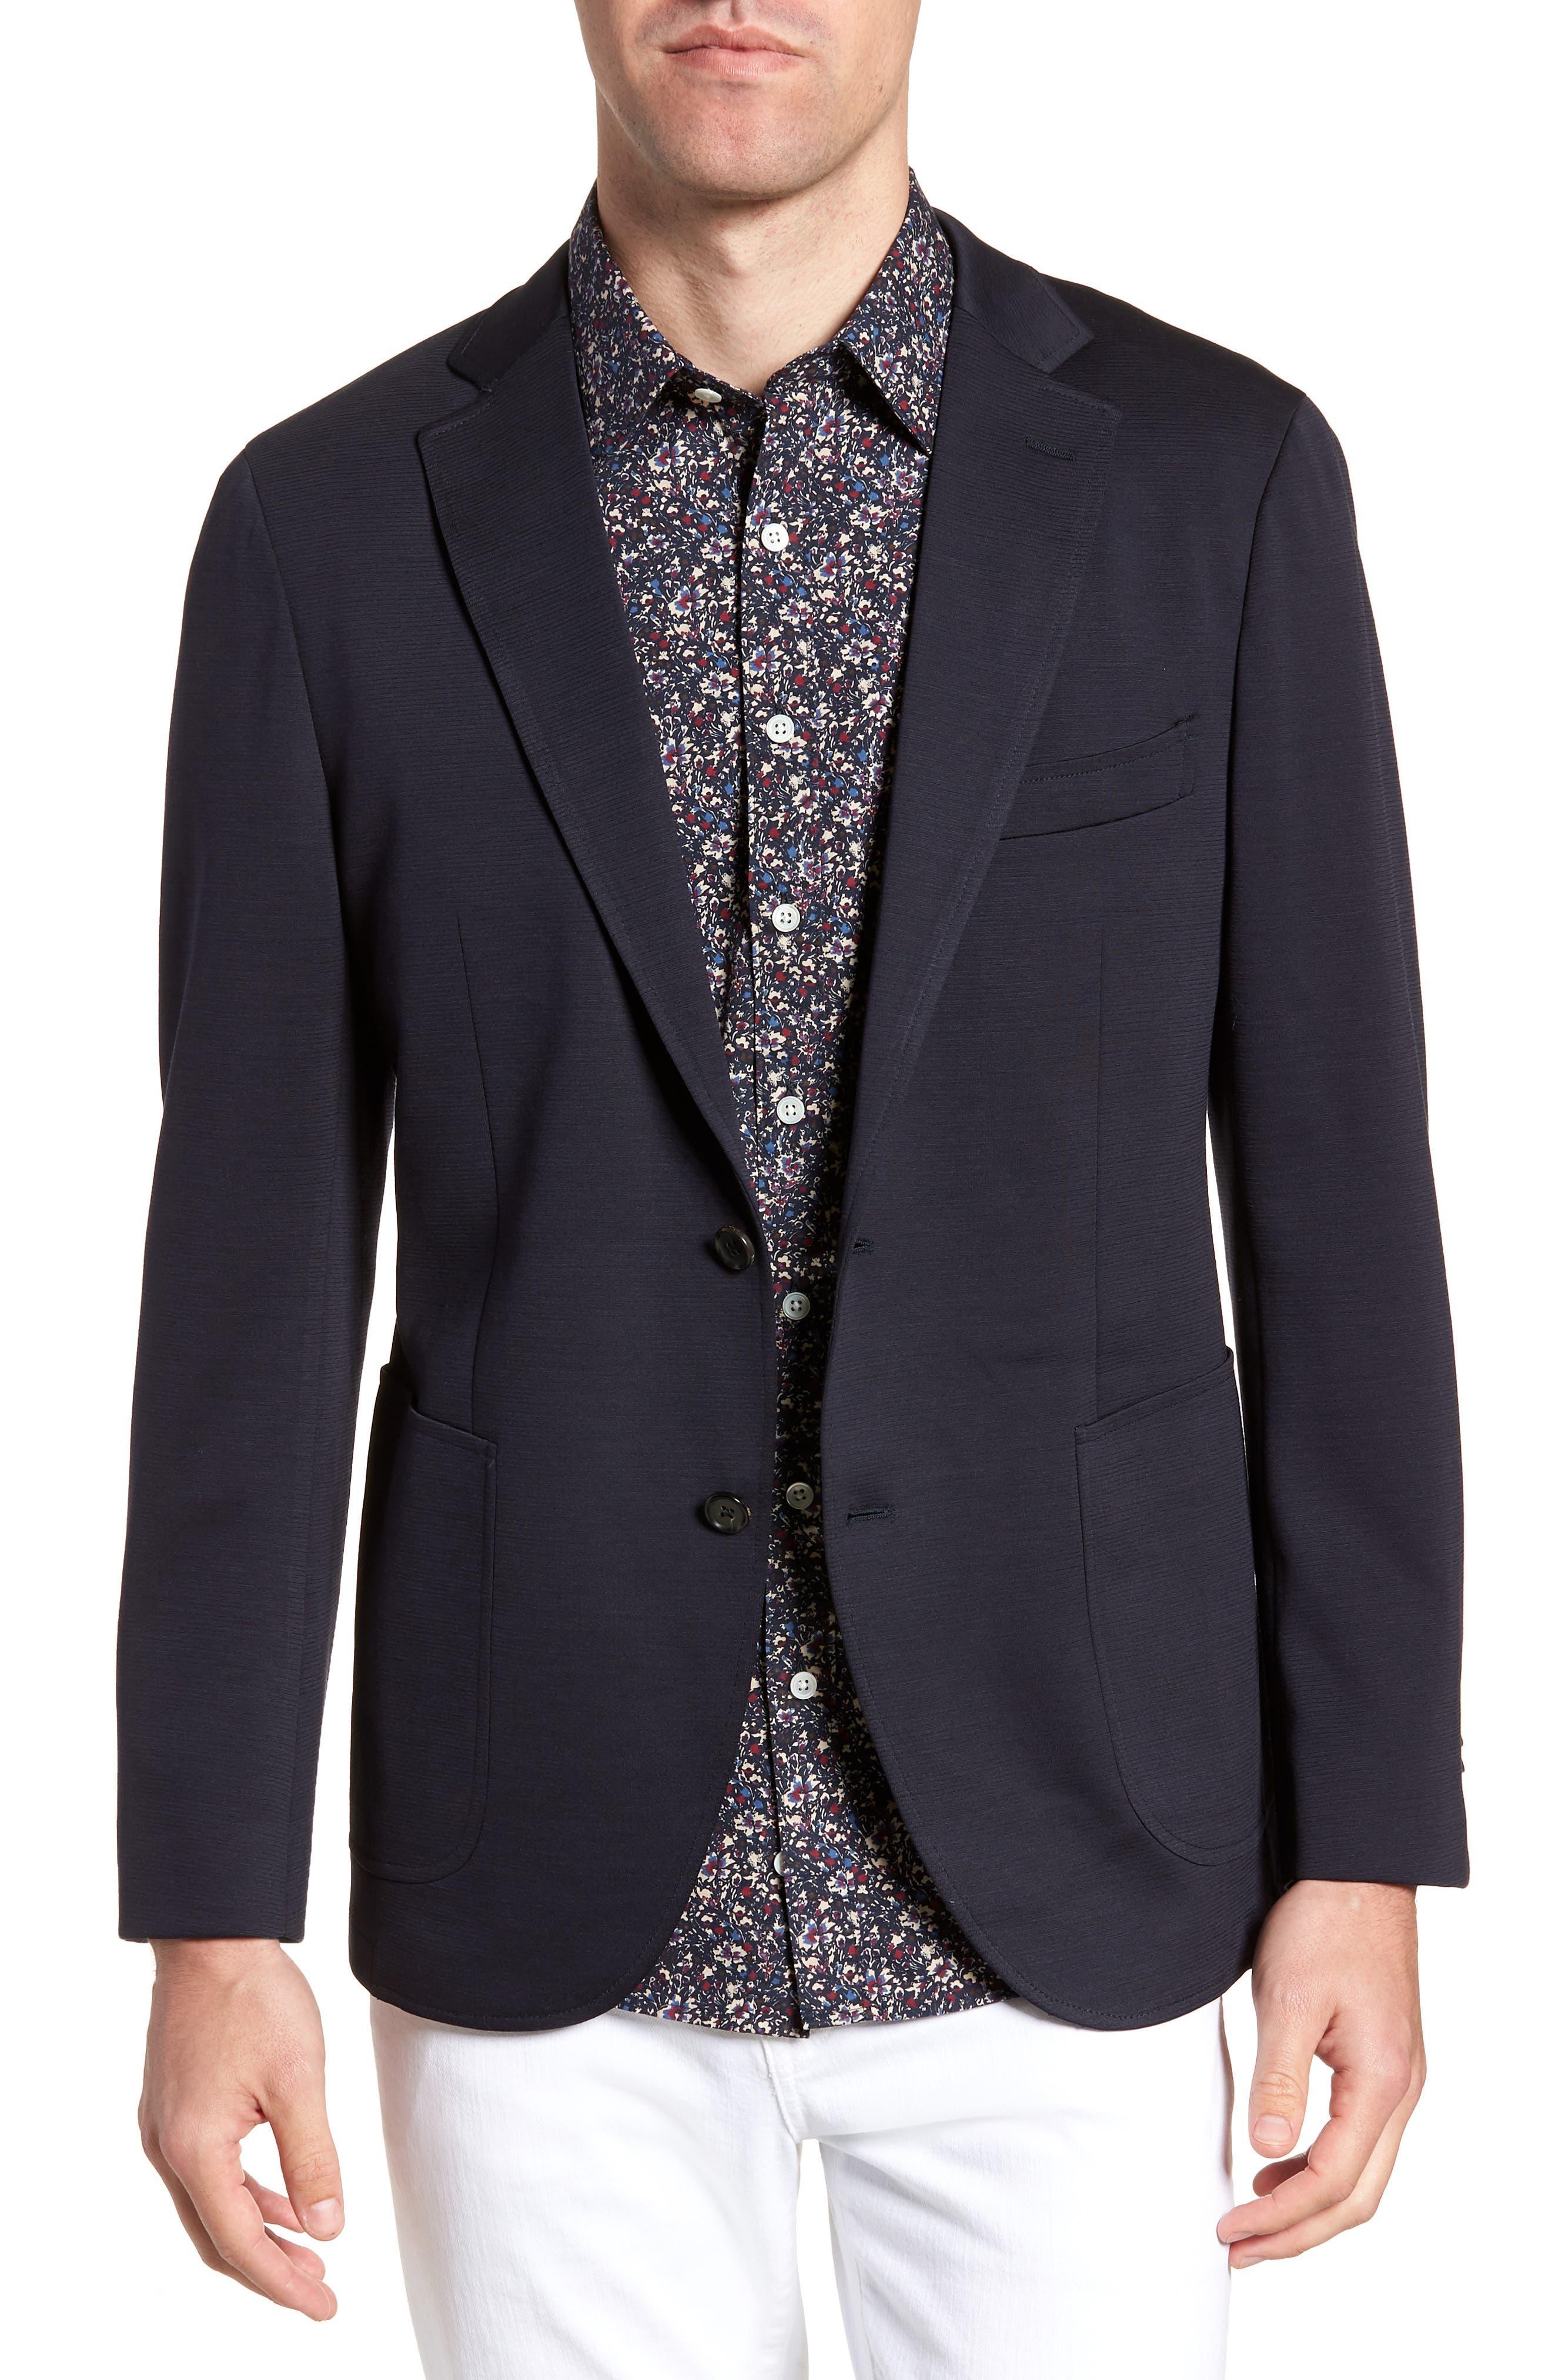 Cardrona Slim Fit Wool Blend Blazer,                         Main,                         color, Navy